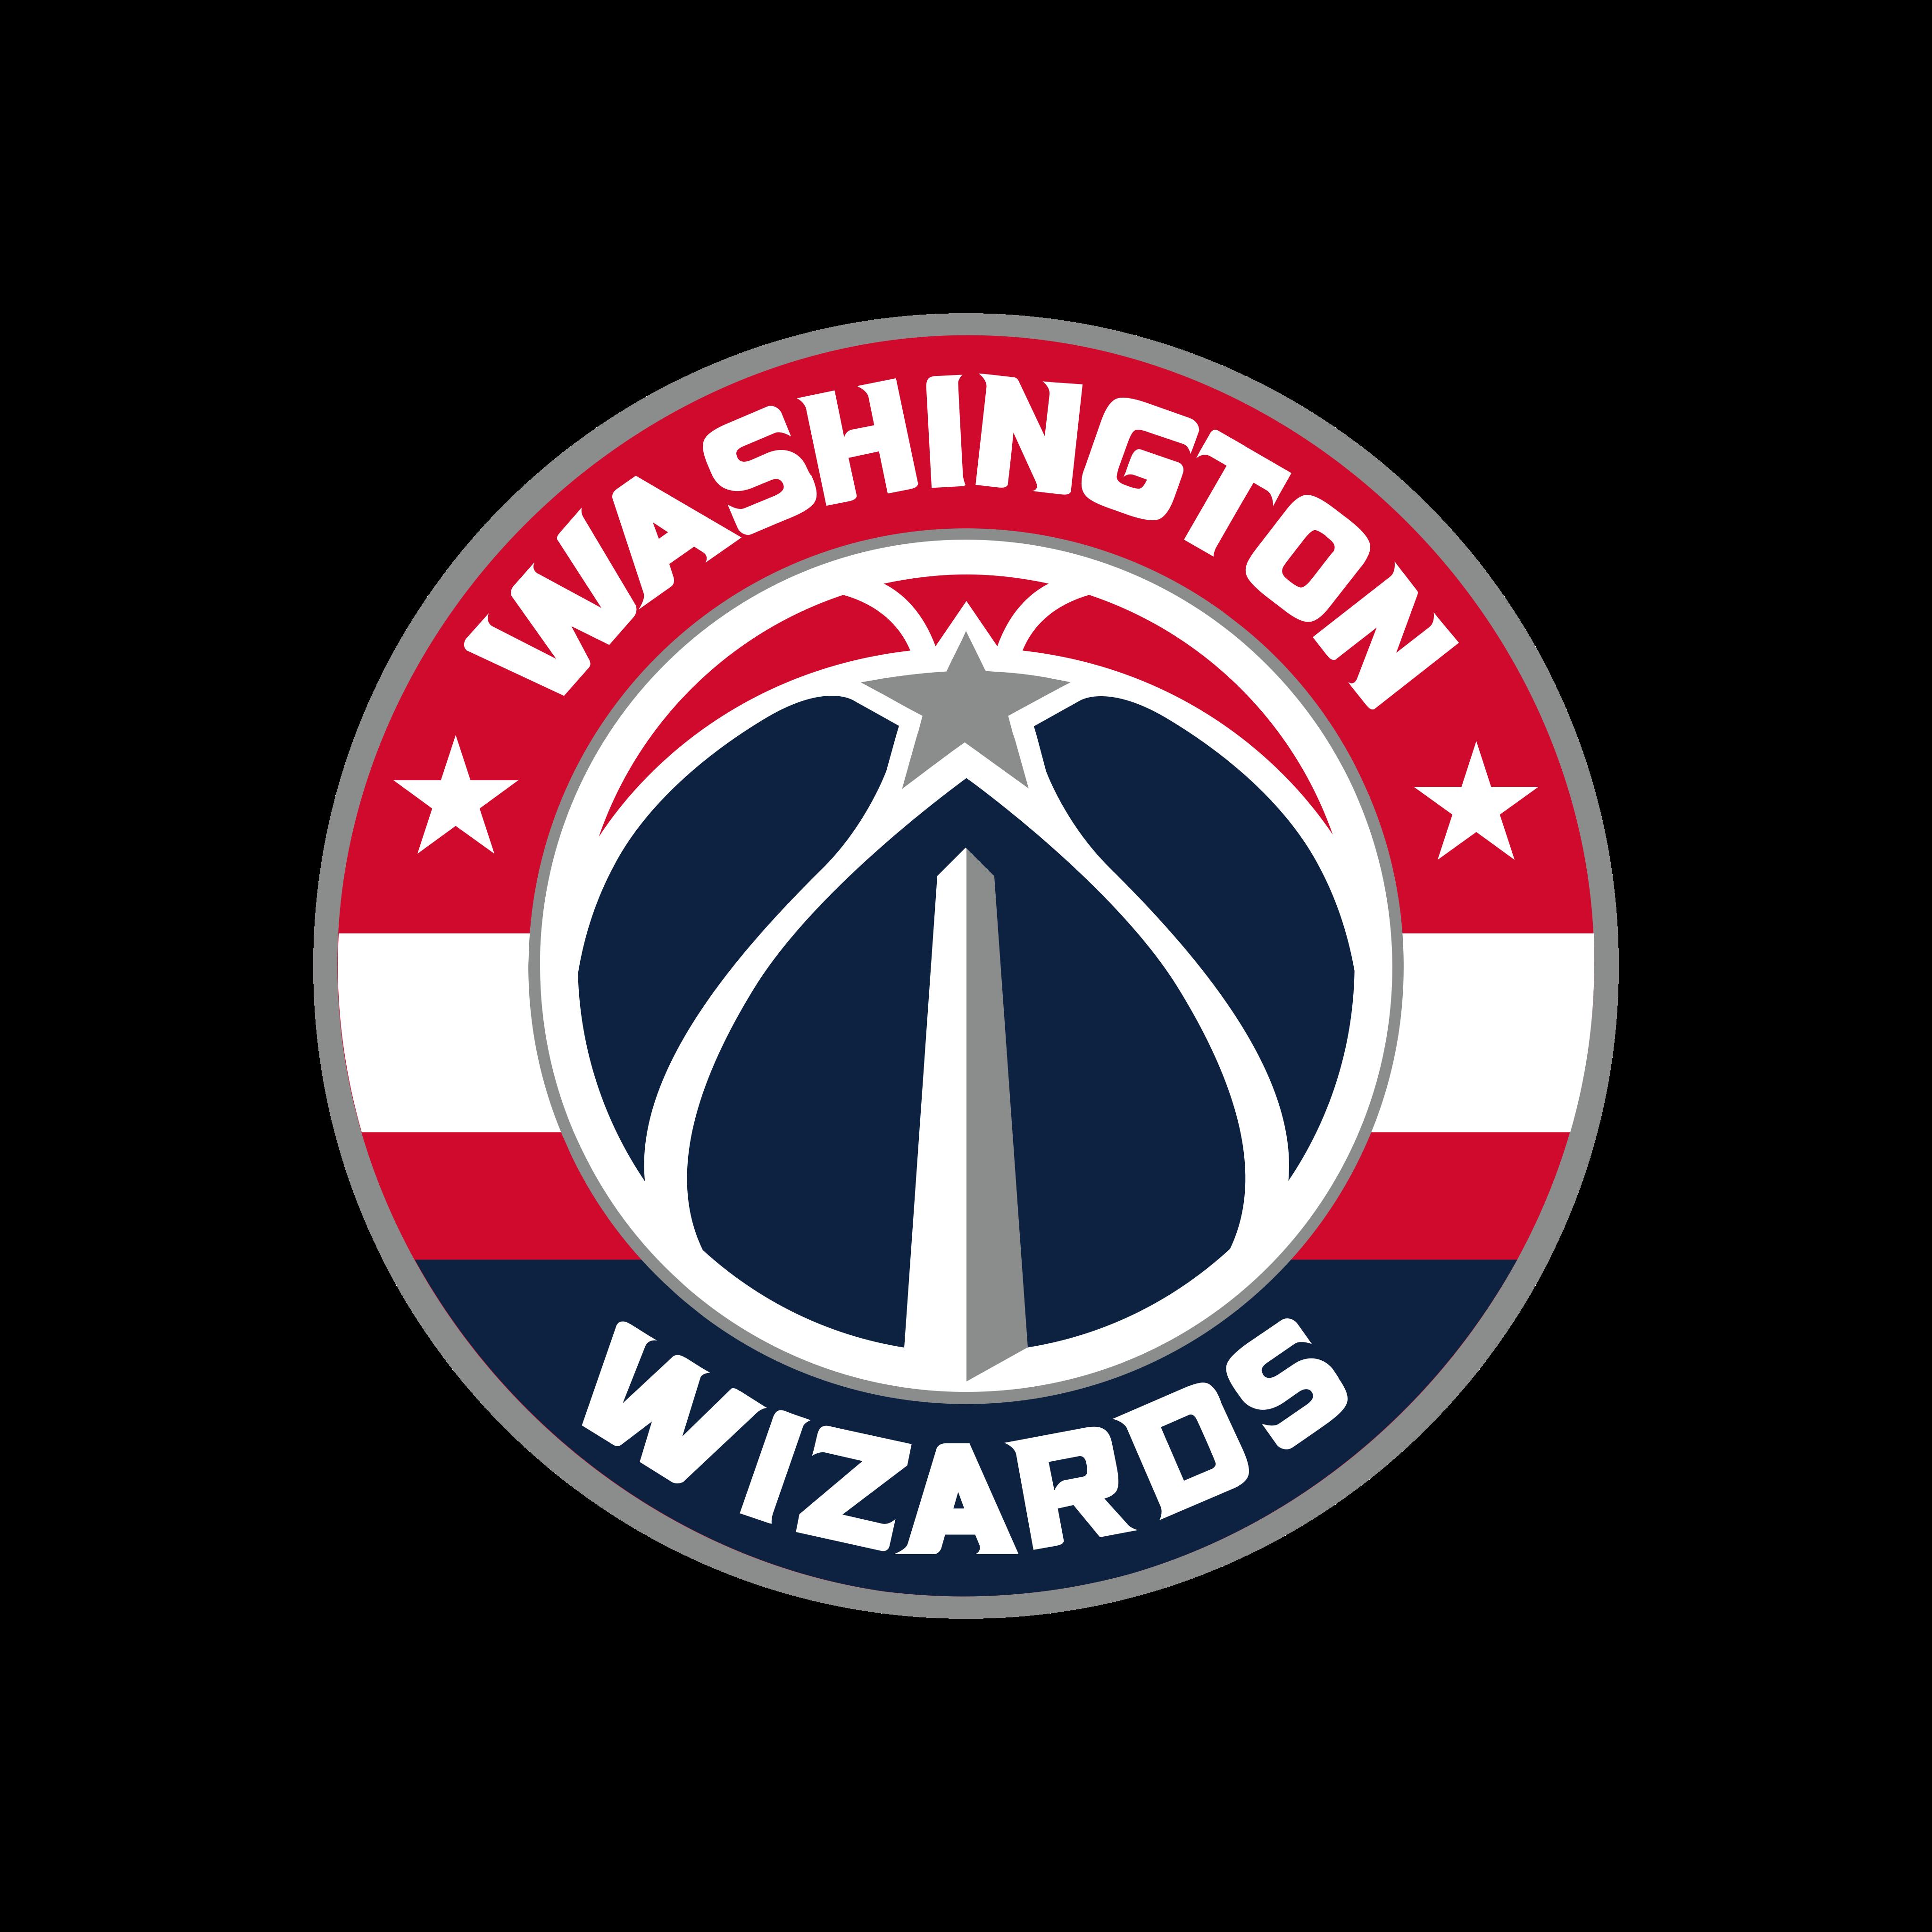 washington wizards logo 0 - Washington Wizards Logo